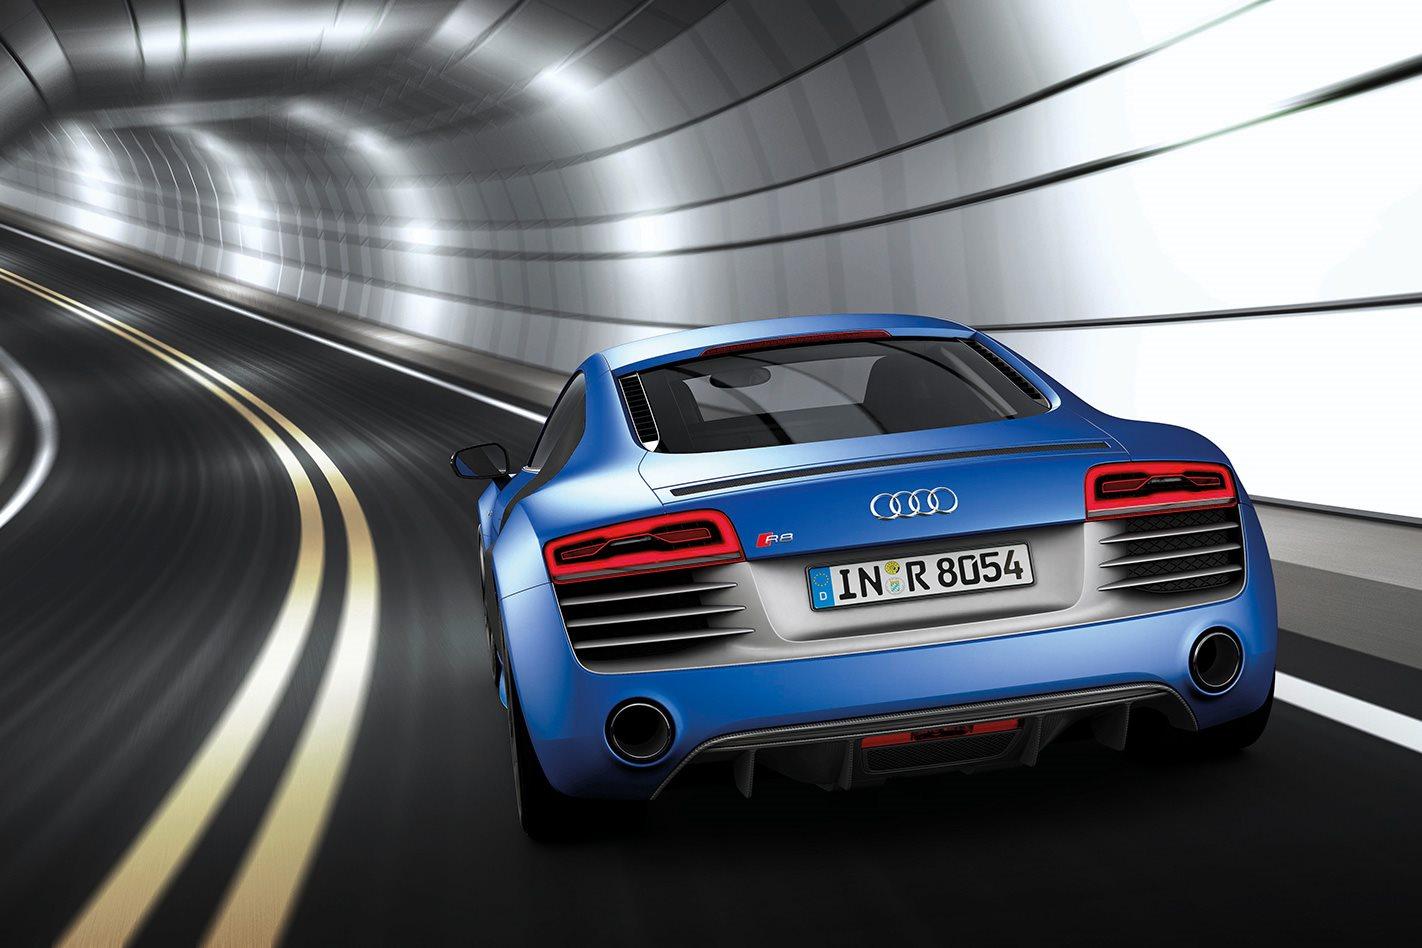 2013-Audi-R8-V10-Plus-rear.jpg